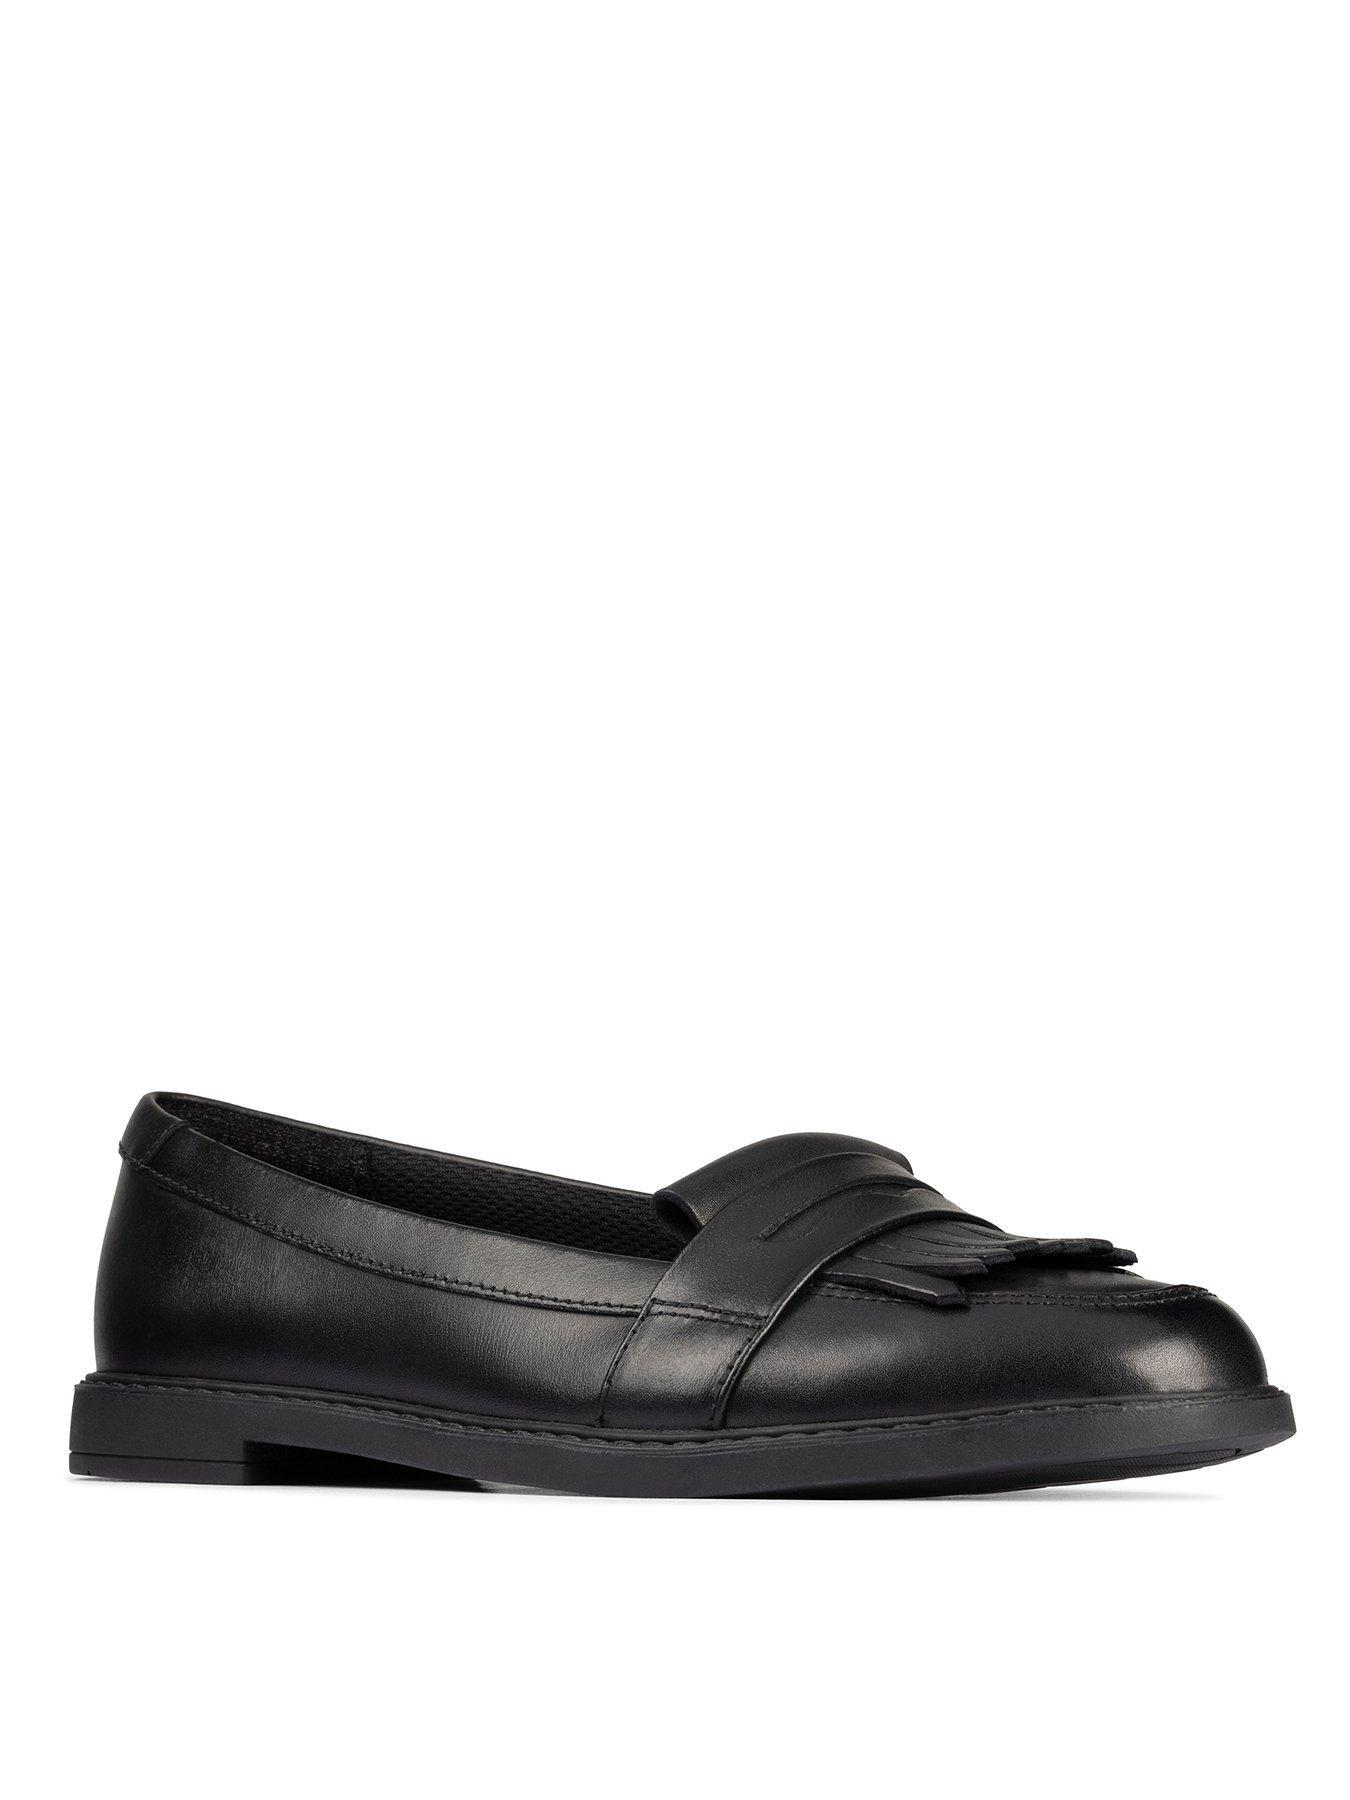 Clarks | Shoes \u0026 boots | Child \u0026 baby